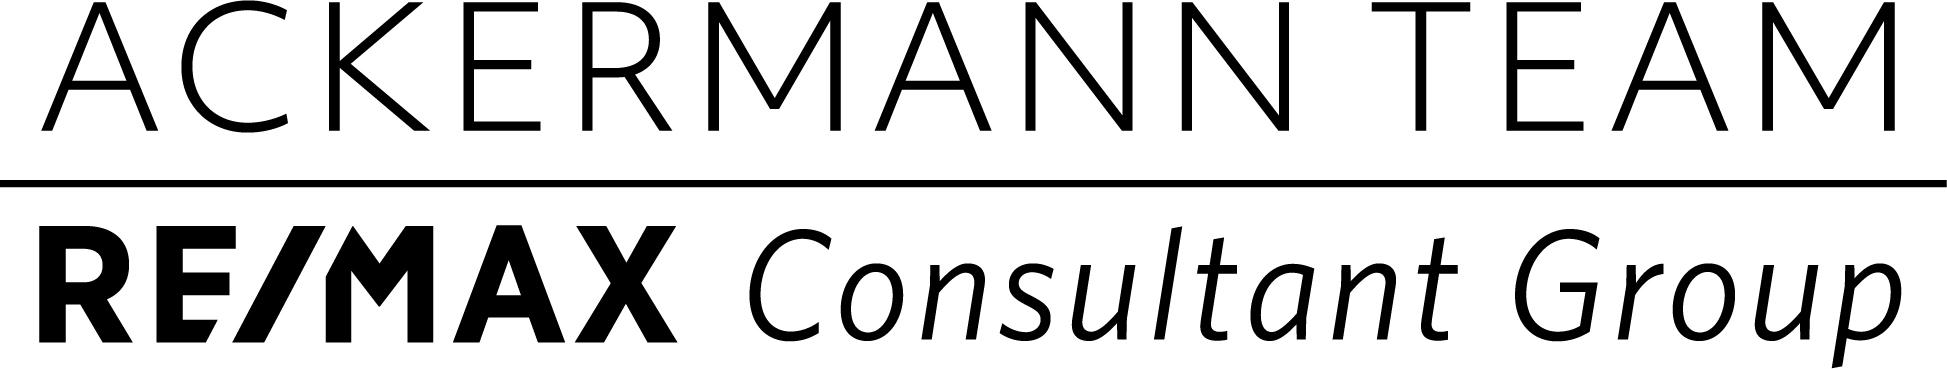 RE/MAX Consultant Group - Ackermann Team